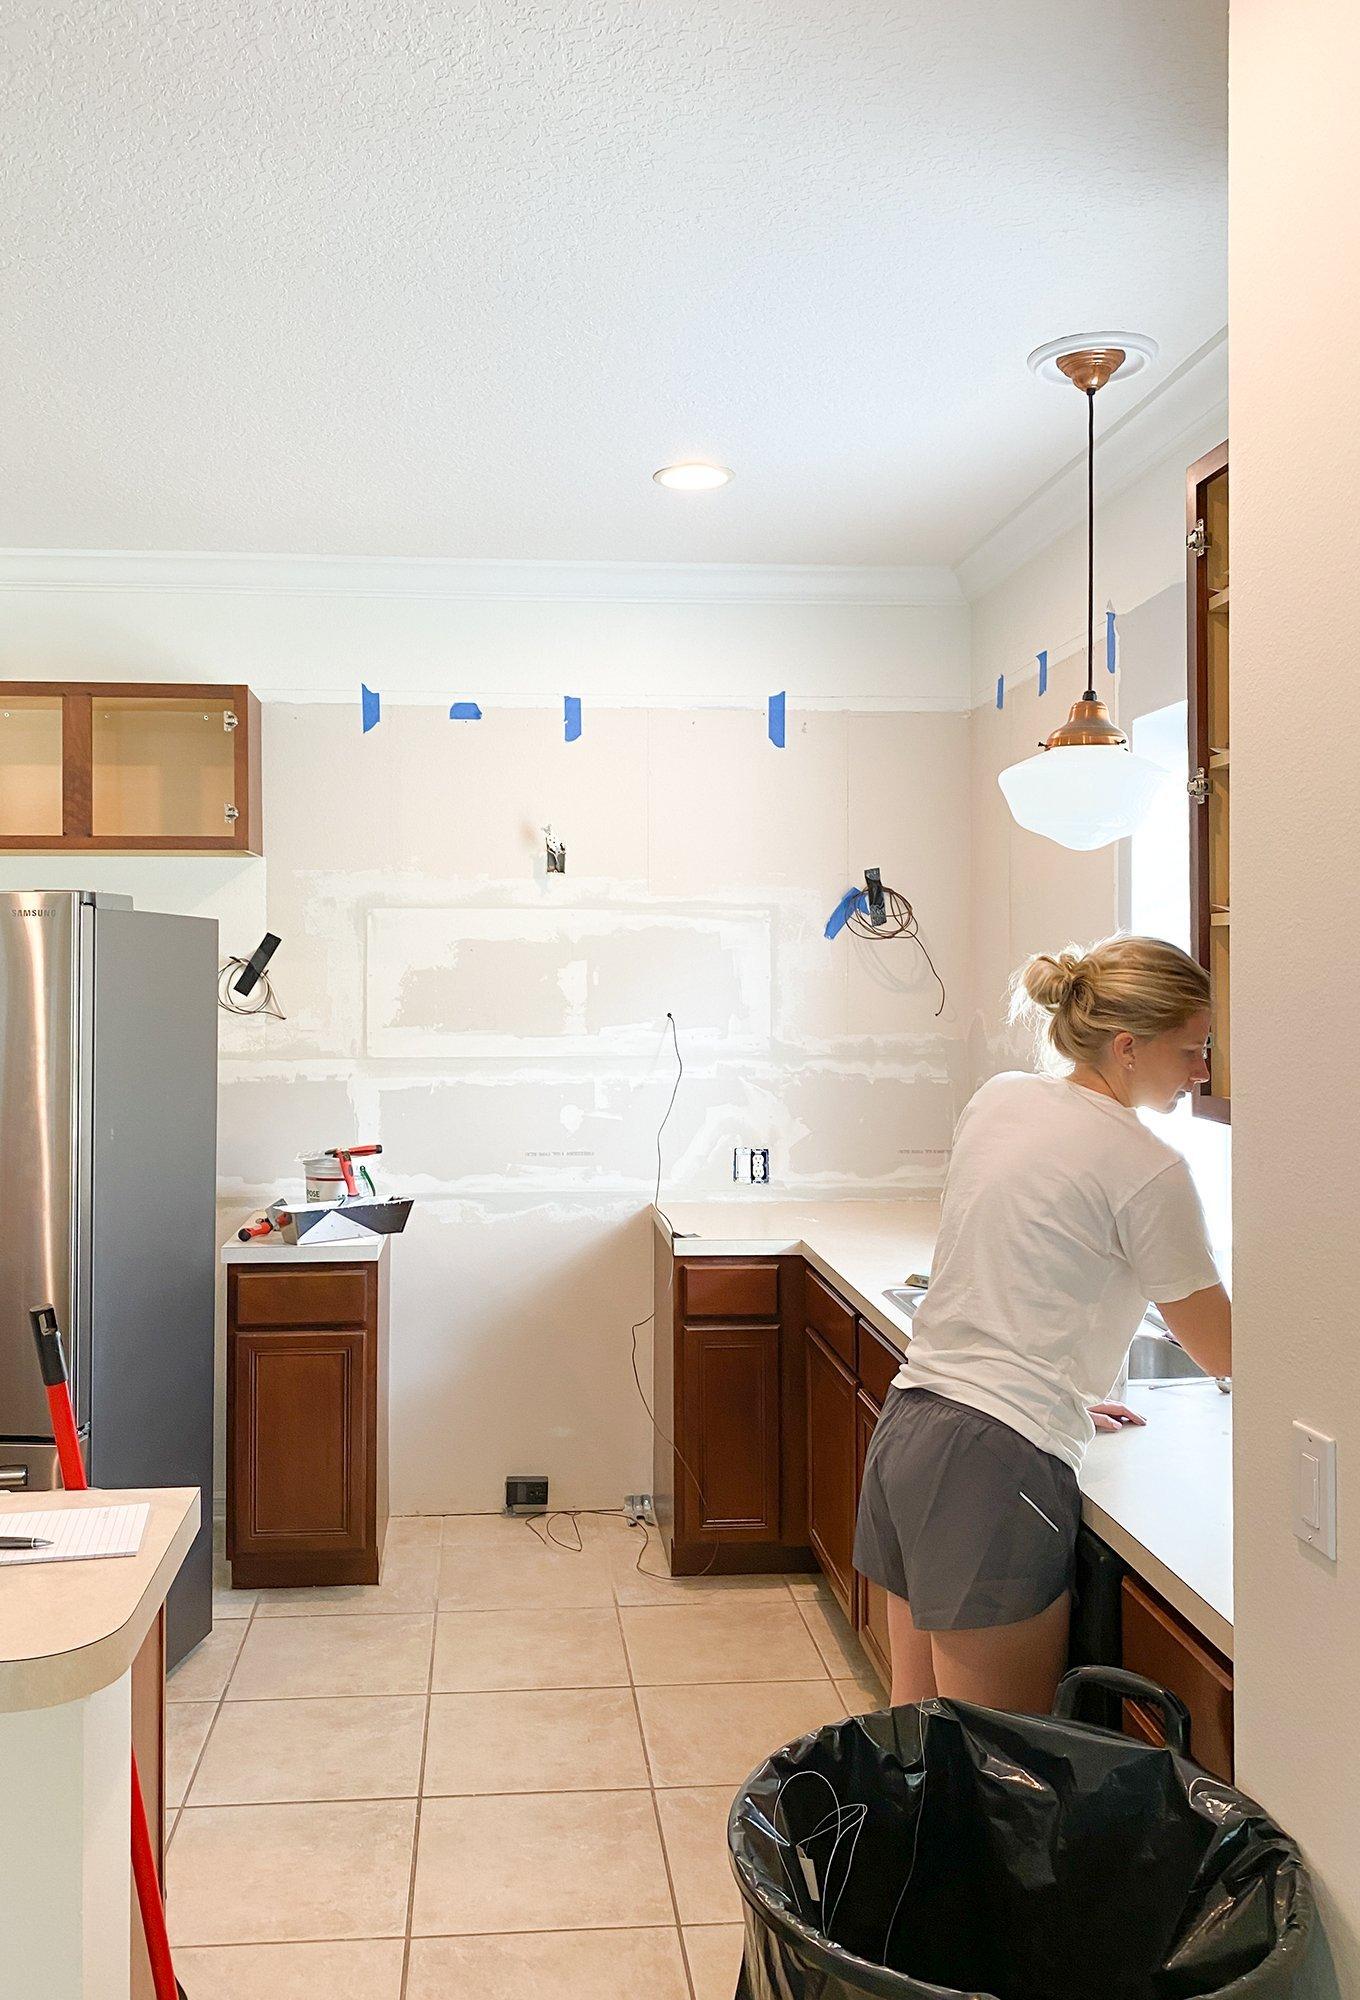 Ashley Brooke's Green Kitchen renovation - replacing drywall